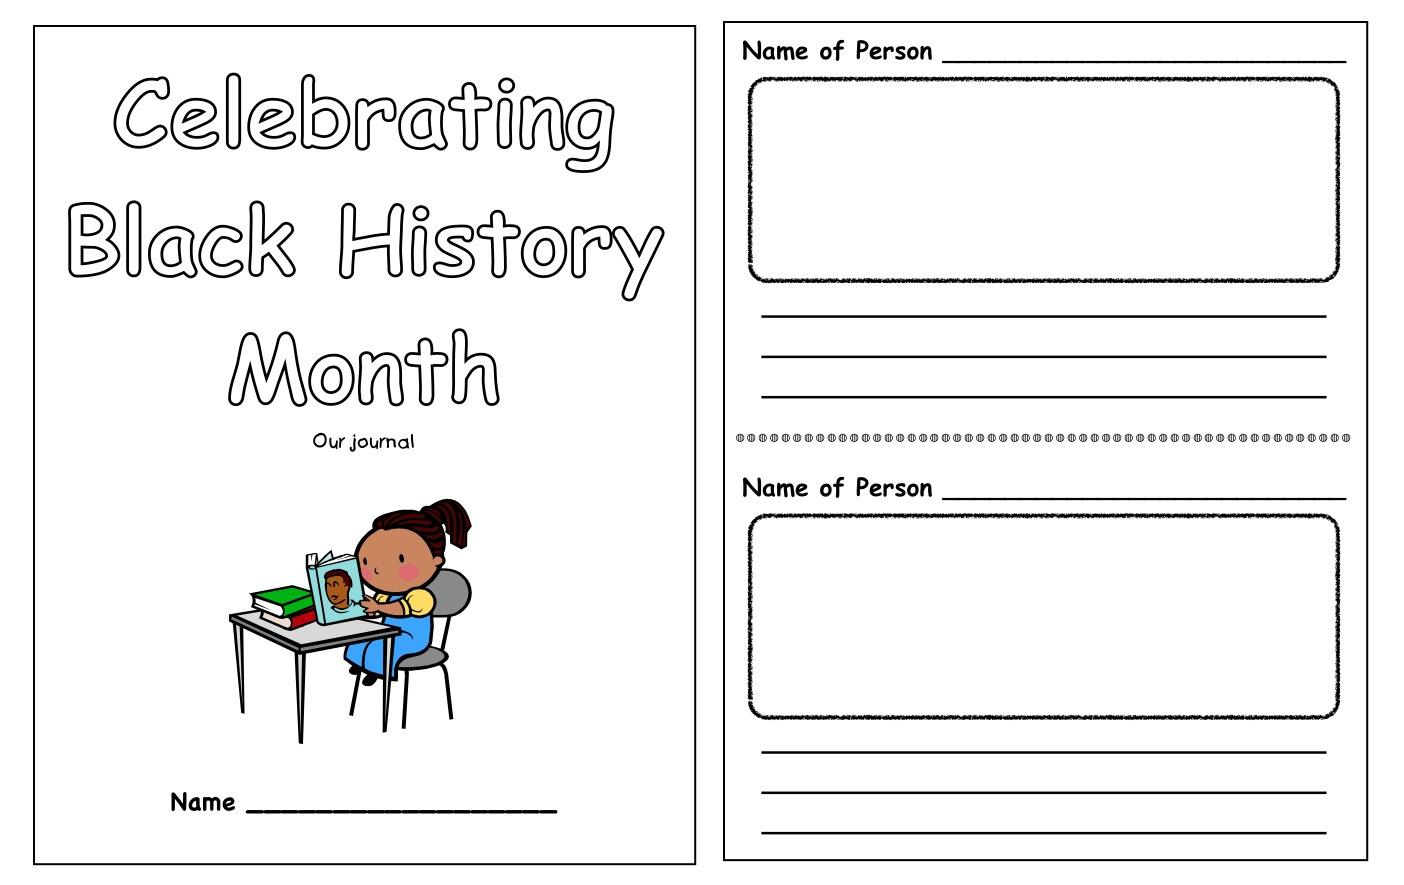 Black History Month Worksheets | Black History